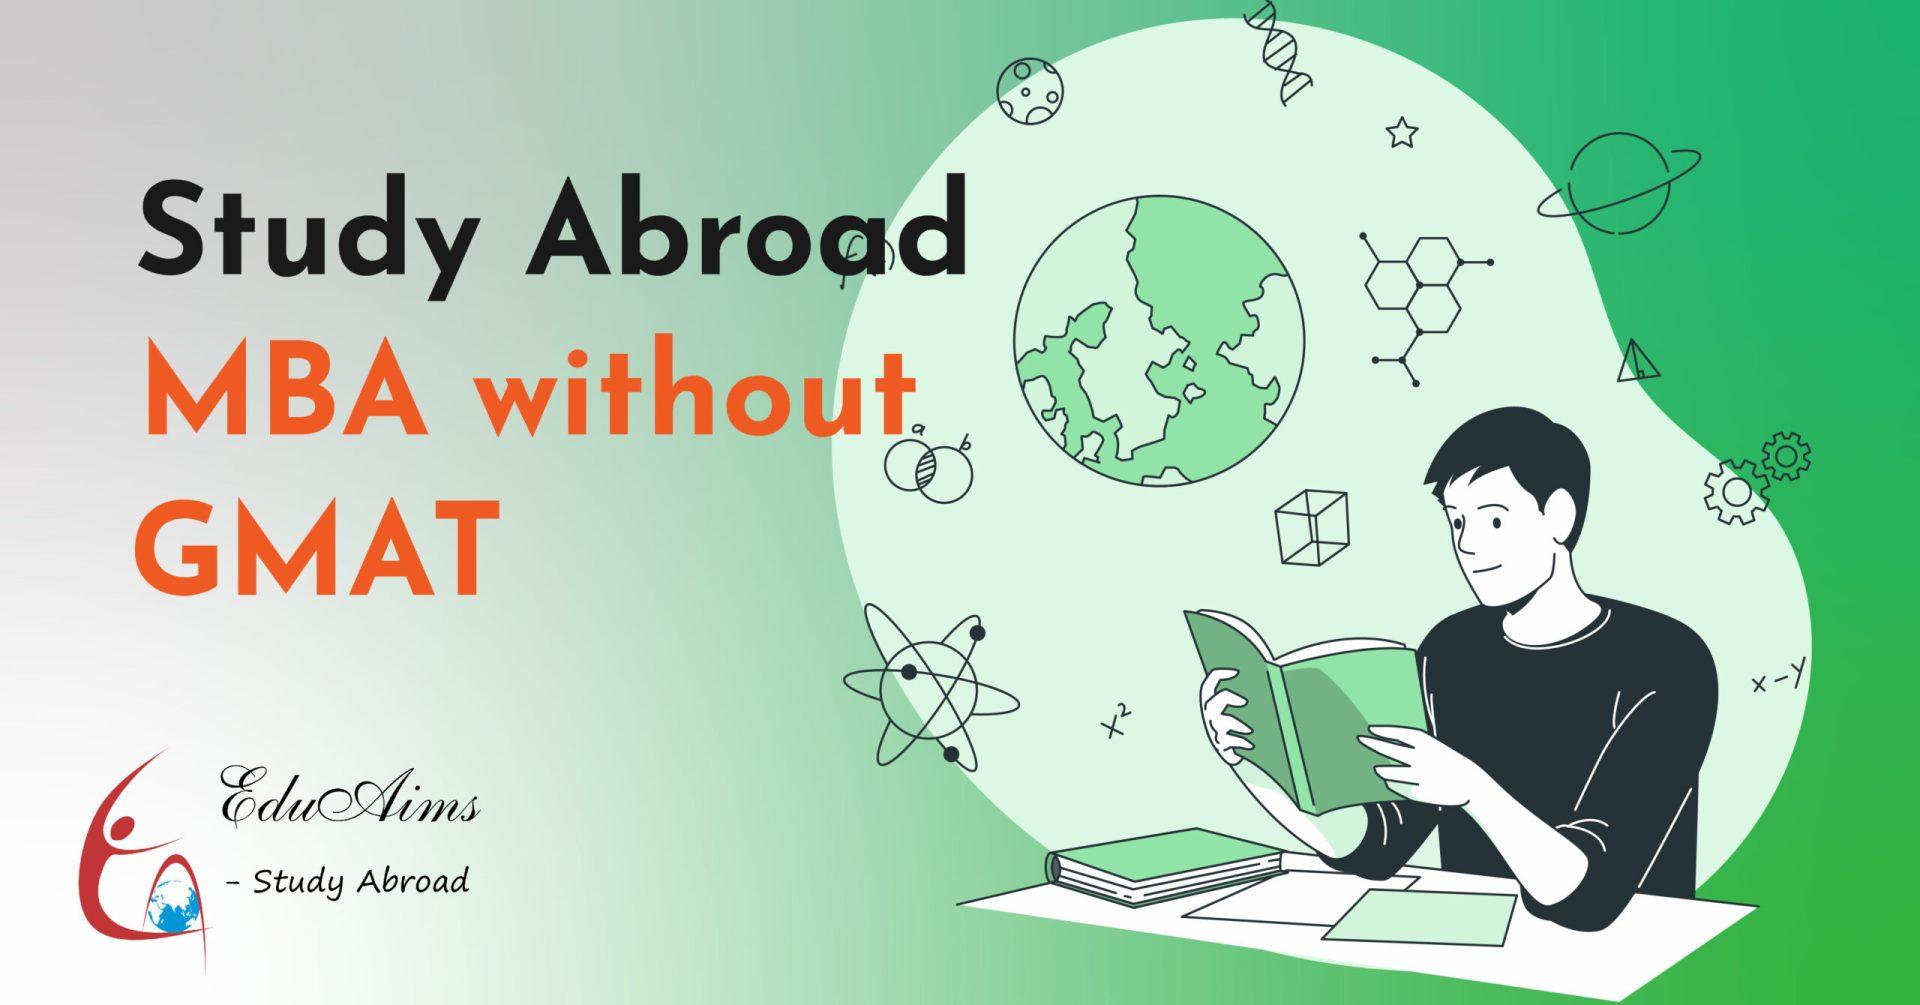 Study Abroad MBA without GMAT